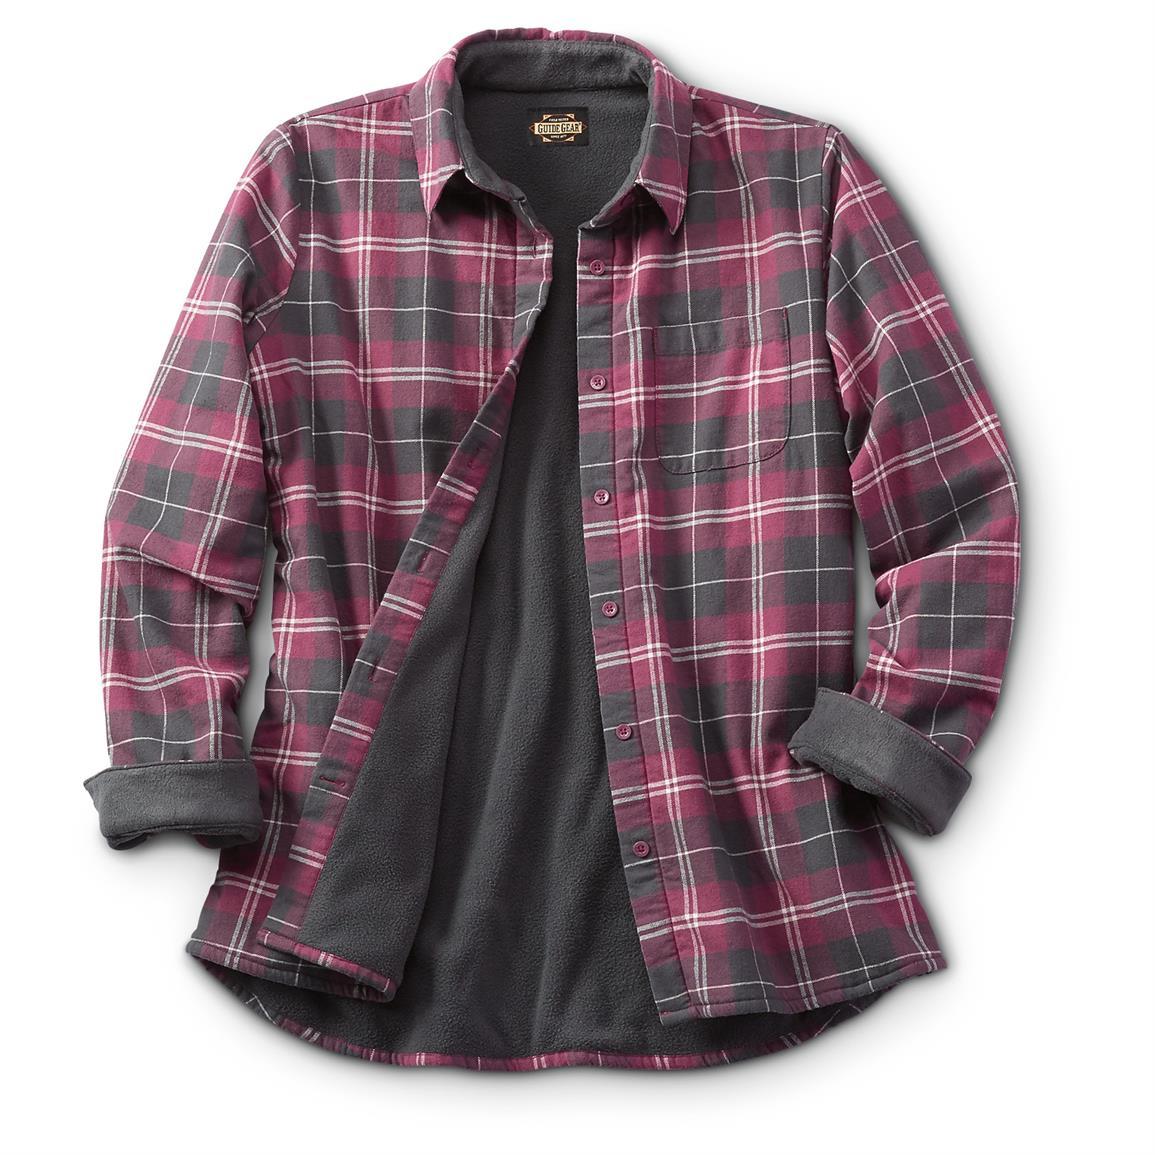 womens flannel shirt guide gear womenu0027s fleece-lined flannel shirt, wine kiyzbno